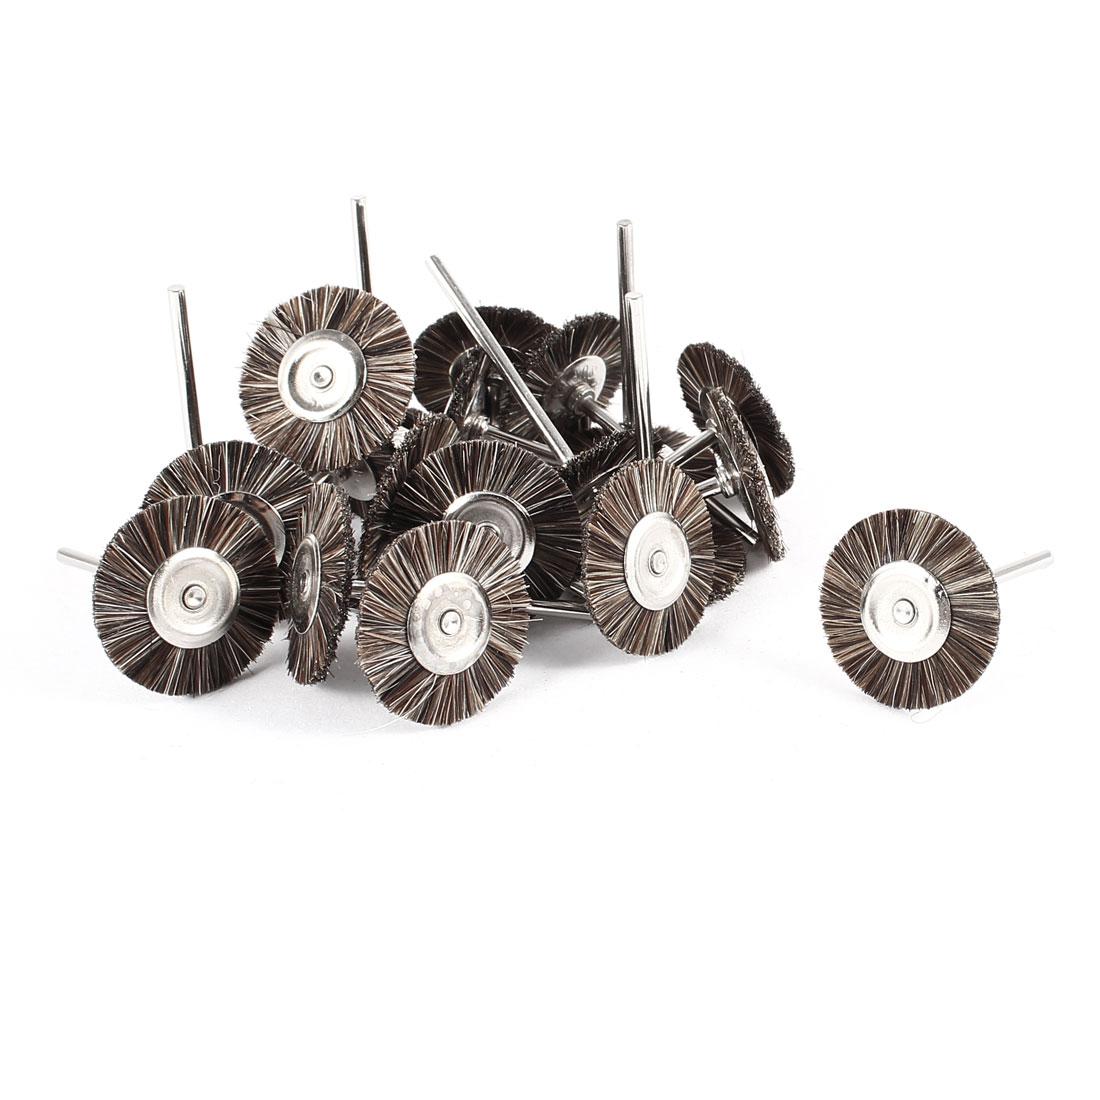 20 Pcs 25mm Dia Gray Nylon Brush Polishing Wheel Polishers for Rotary Tool